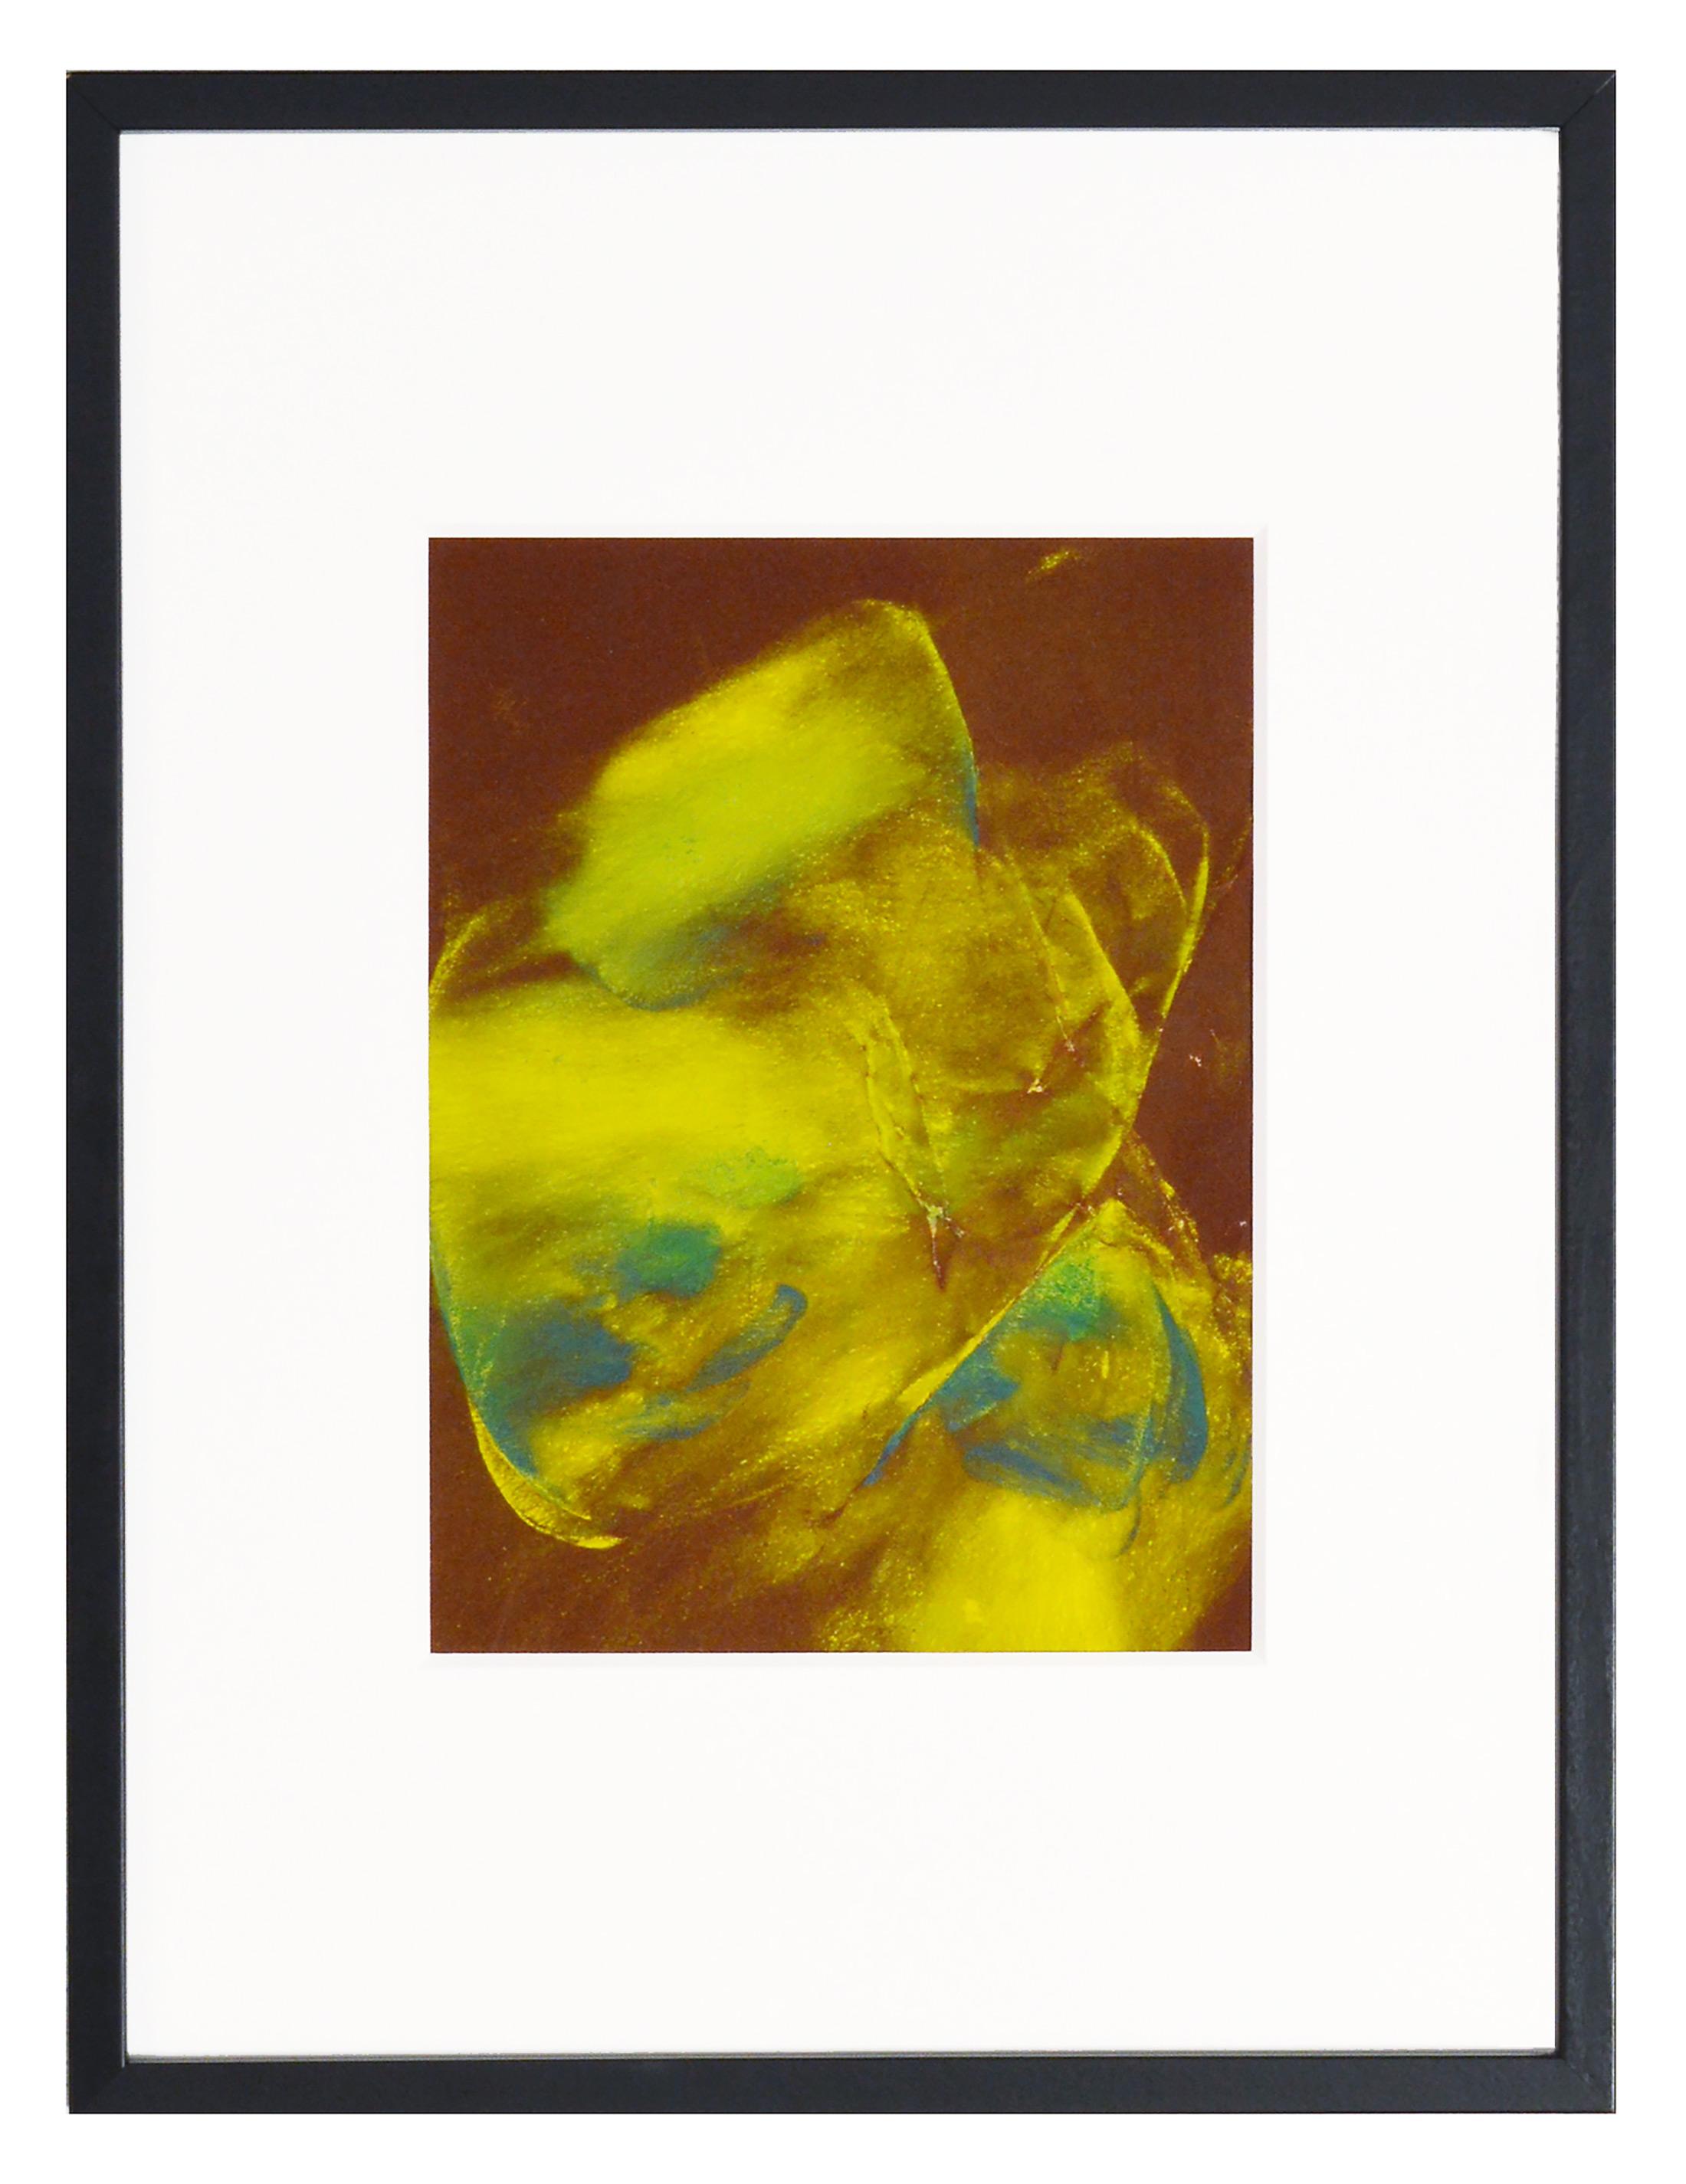 artwork, image, abtrieb, emanuel ehgartner